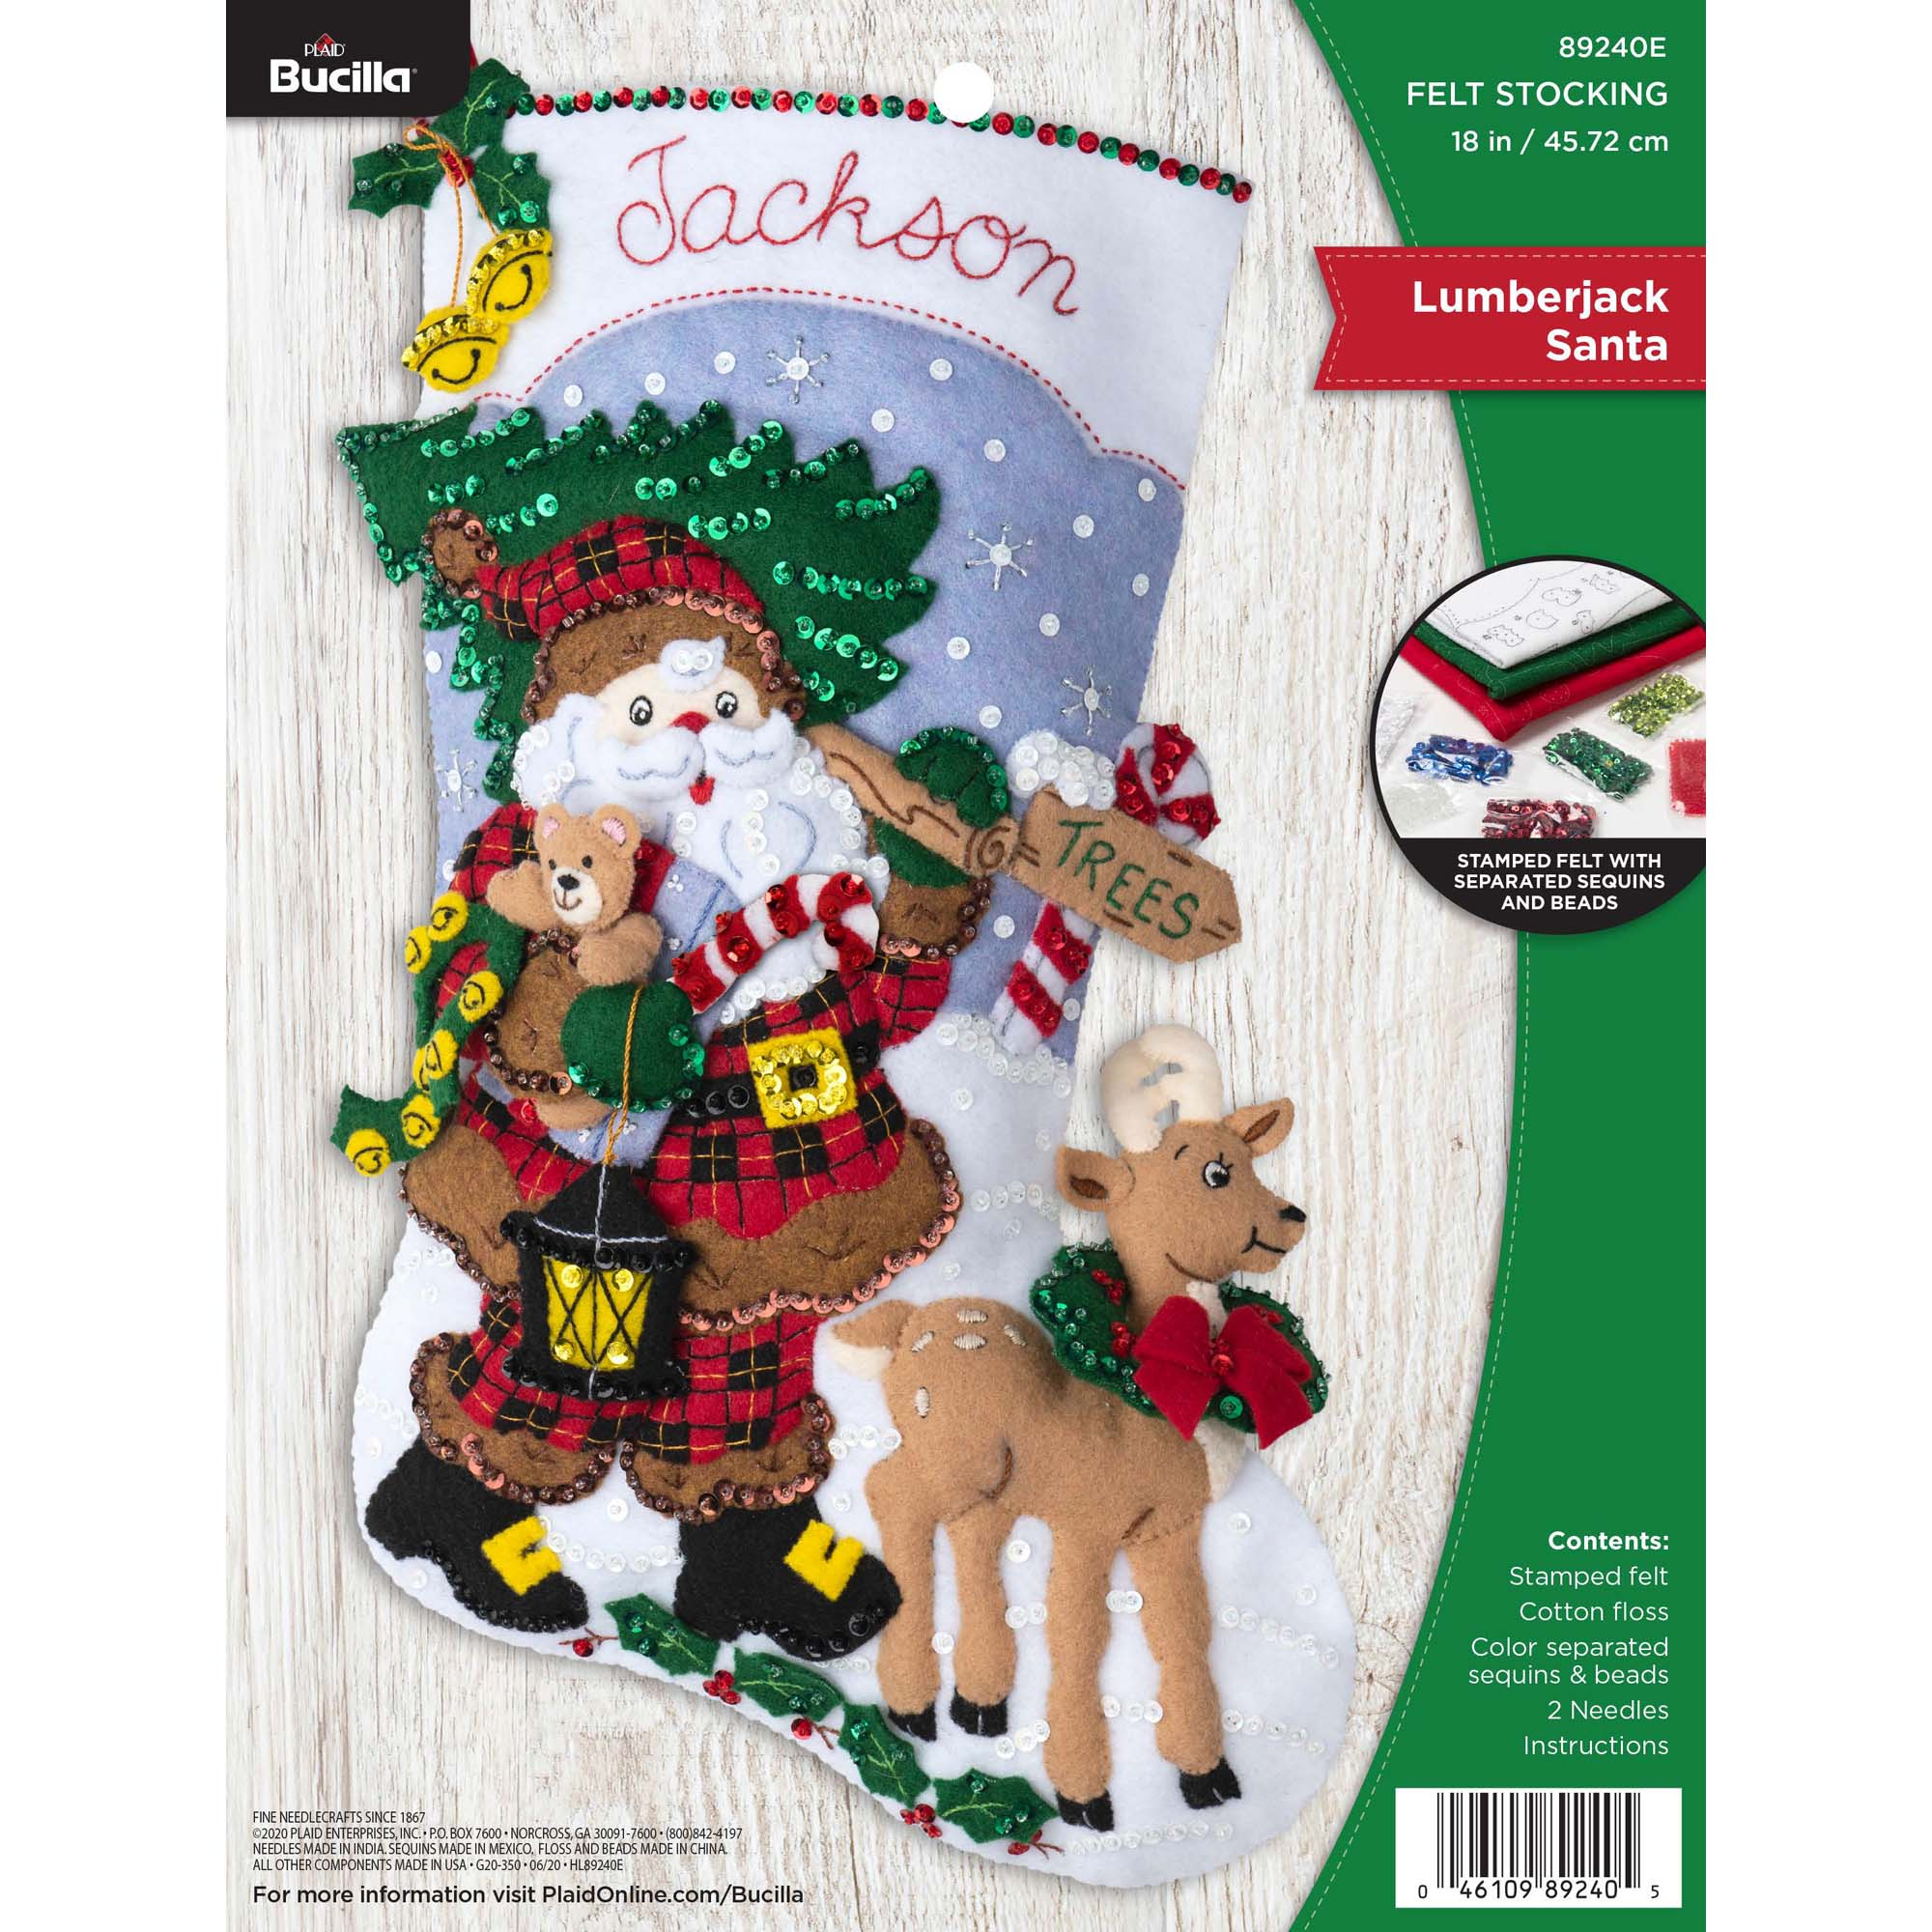 Bucilla ® Seasonal - Felt - Stocking Kits - Lumberjack Santa - 89240E